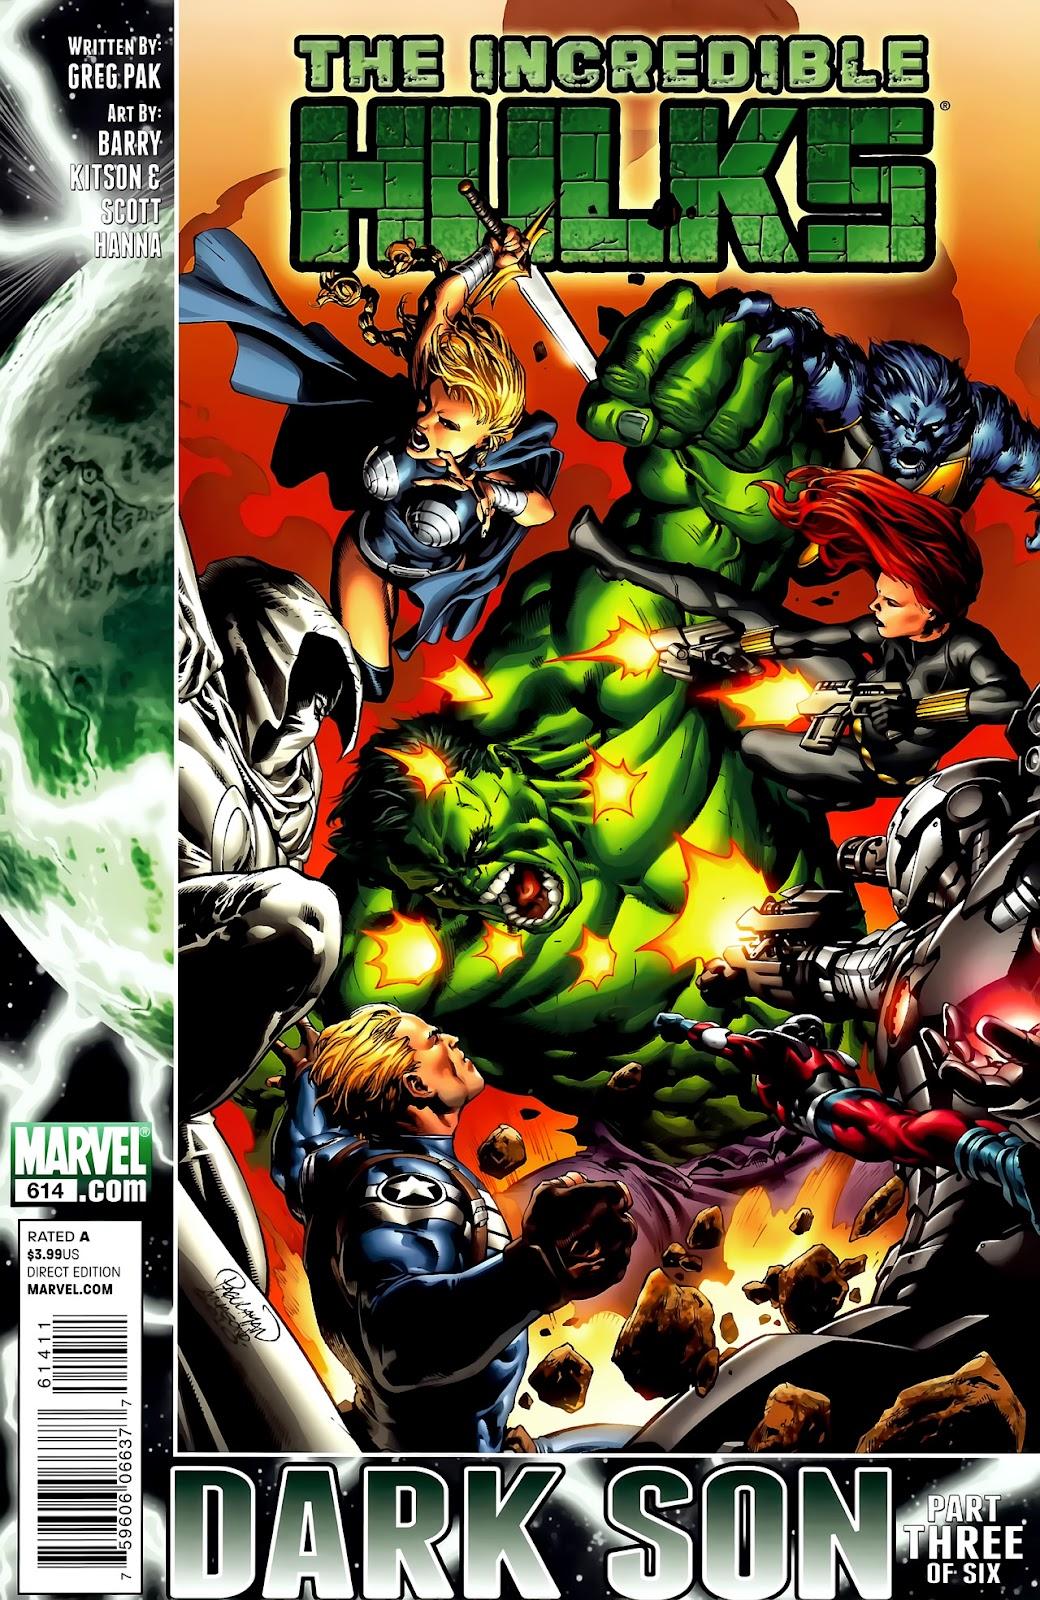 Incredible Hulks (2010) Issue #614 #4 - English 1